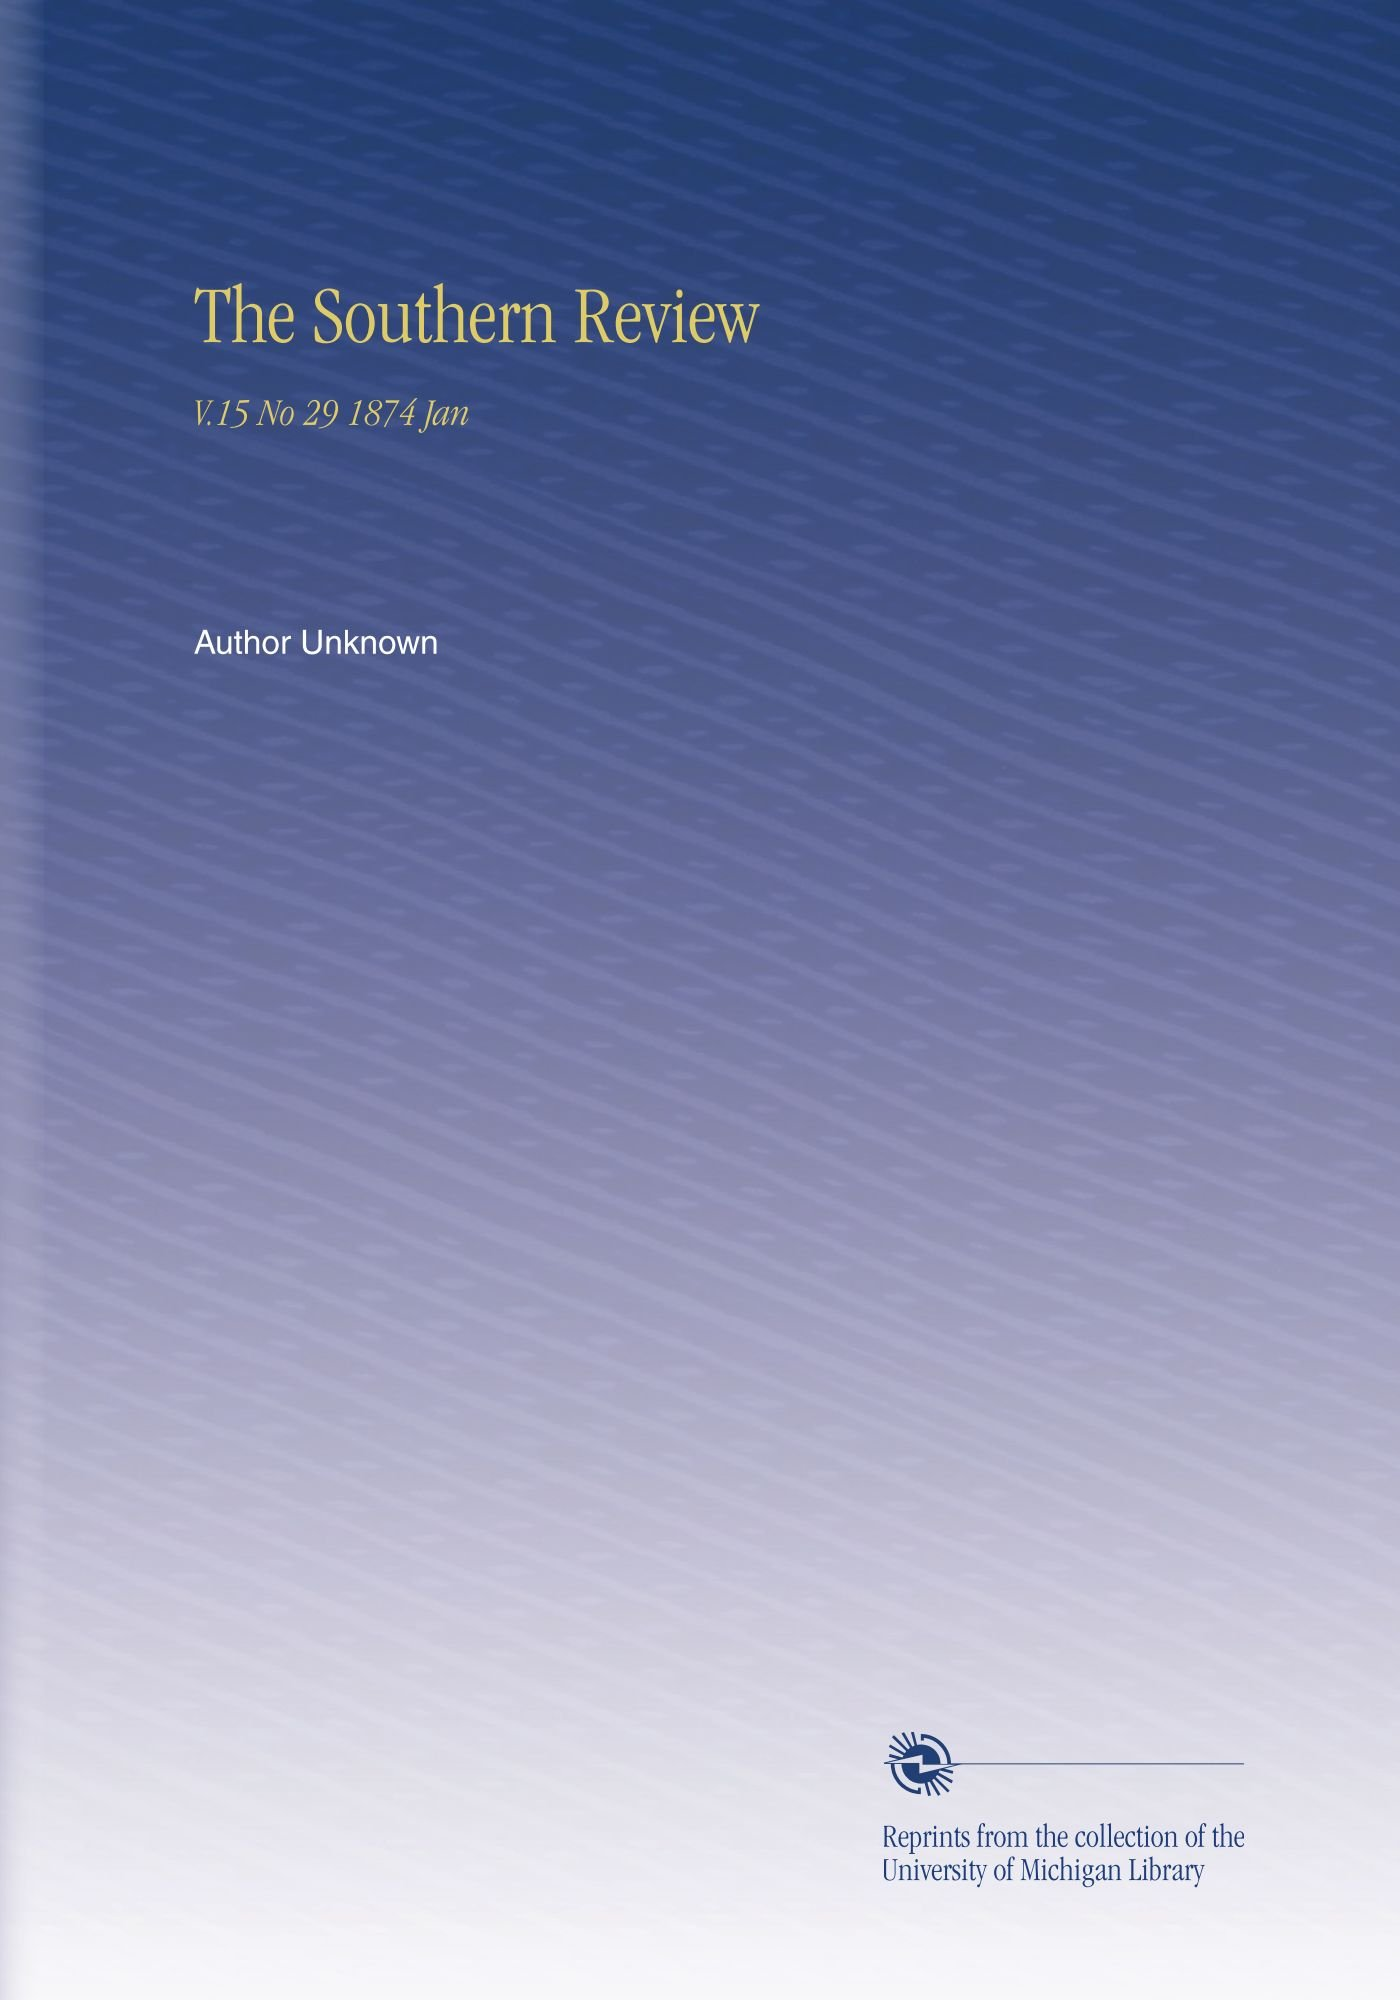 Read Online The Southern Review: V.15 No 29 1874 Jan PDF